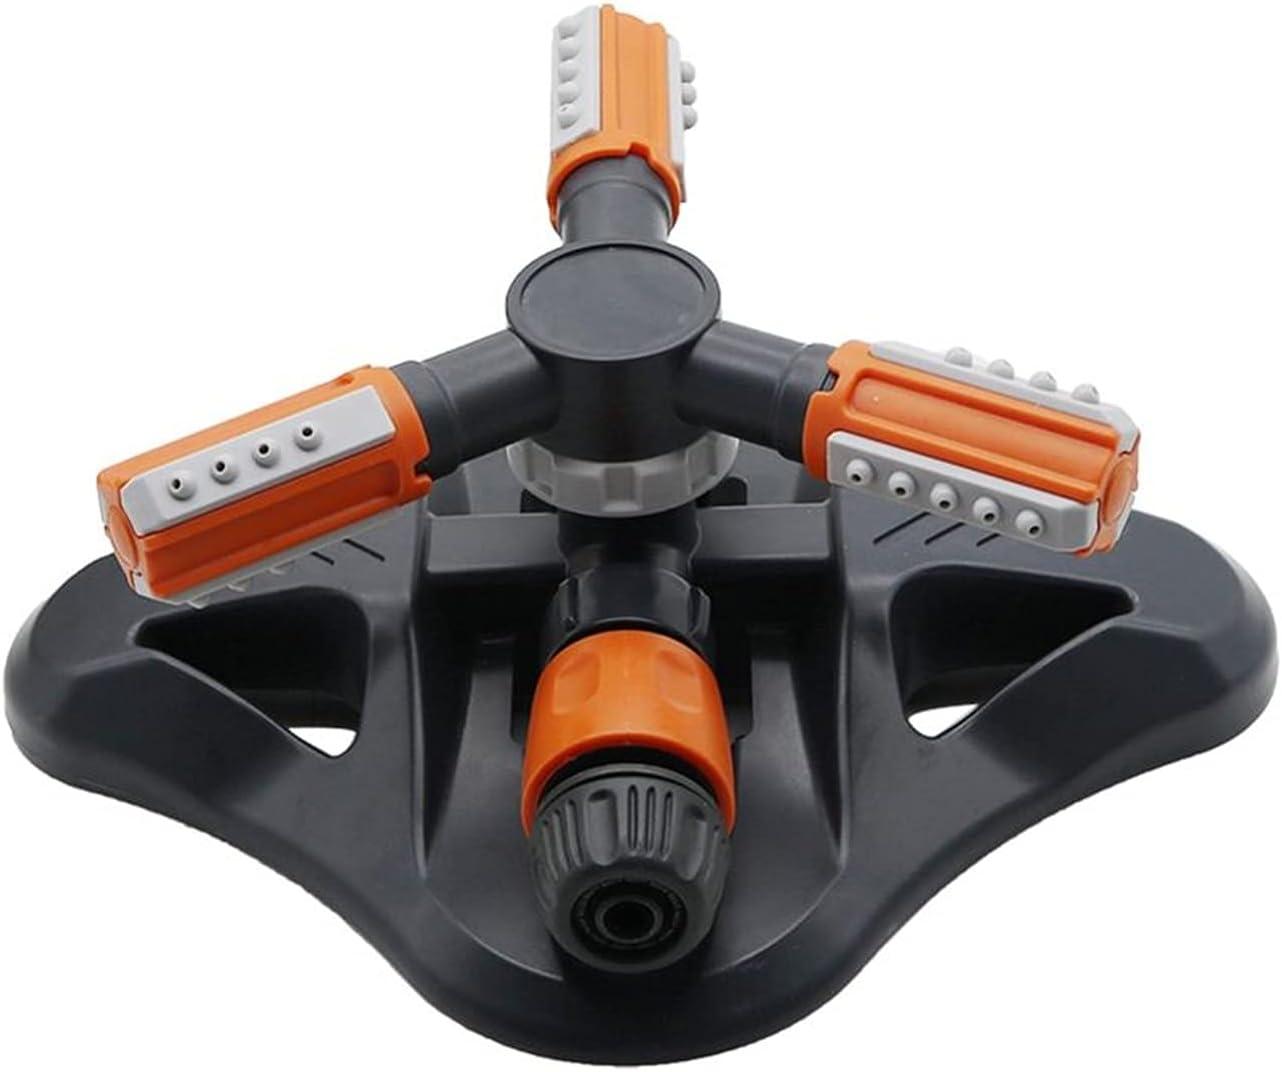 LJLCD Connector Adjustable Sacramento Mall Manufacturer direct delivery 360 3-arm Sprinklers Rotating Degree